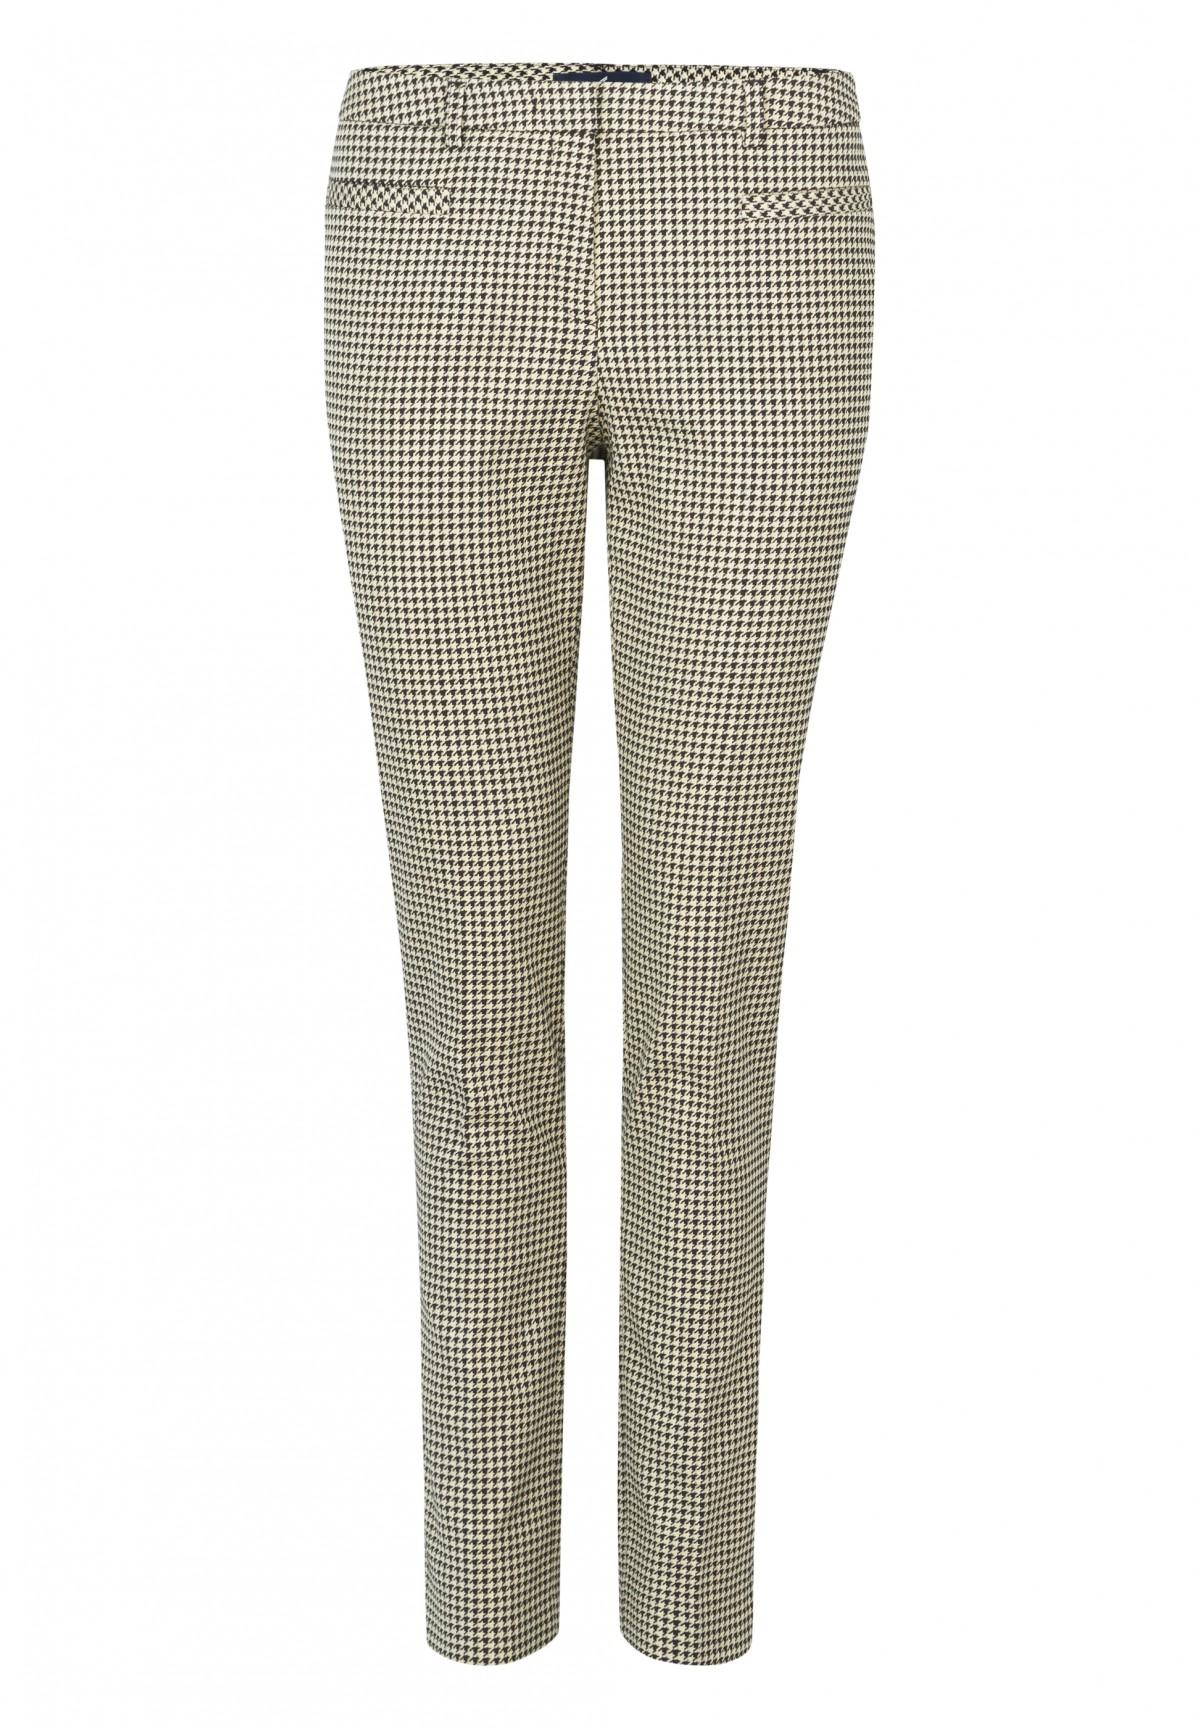 Klassische Hose mit Bügelfalte / Klassische Hose mit Bügelfalte